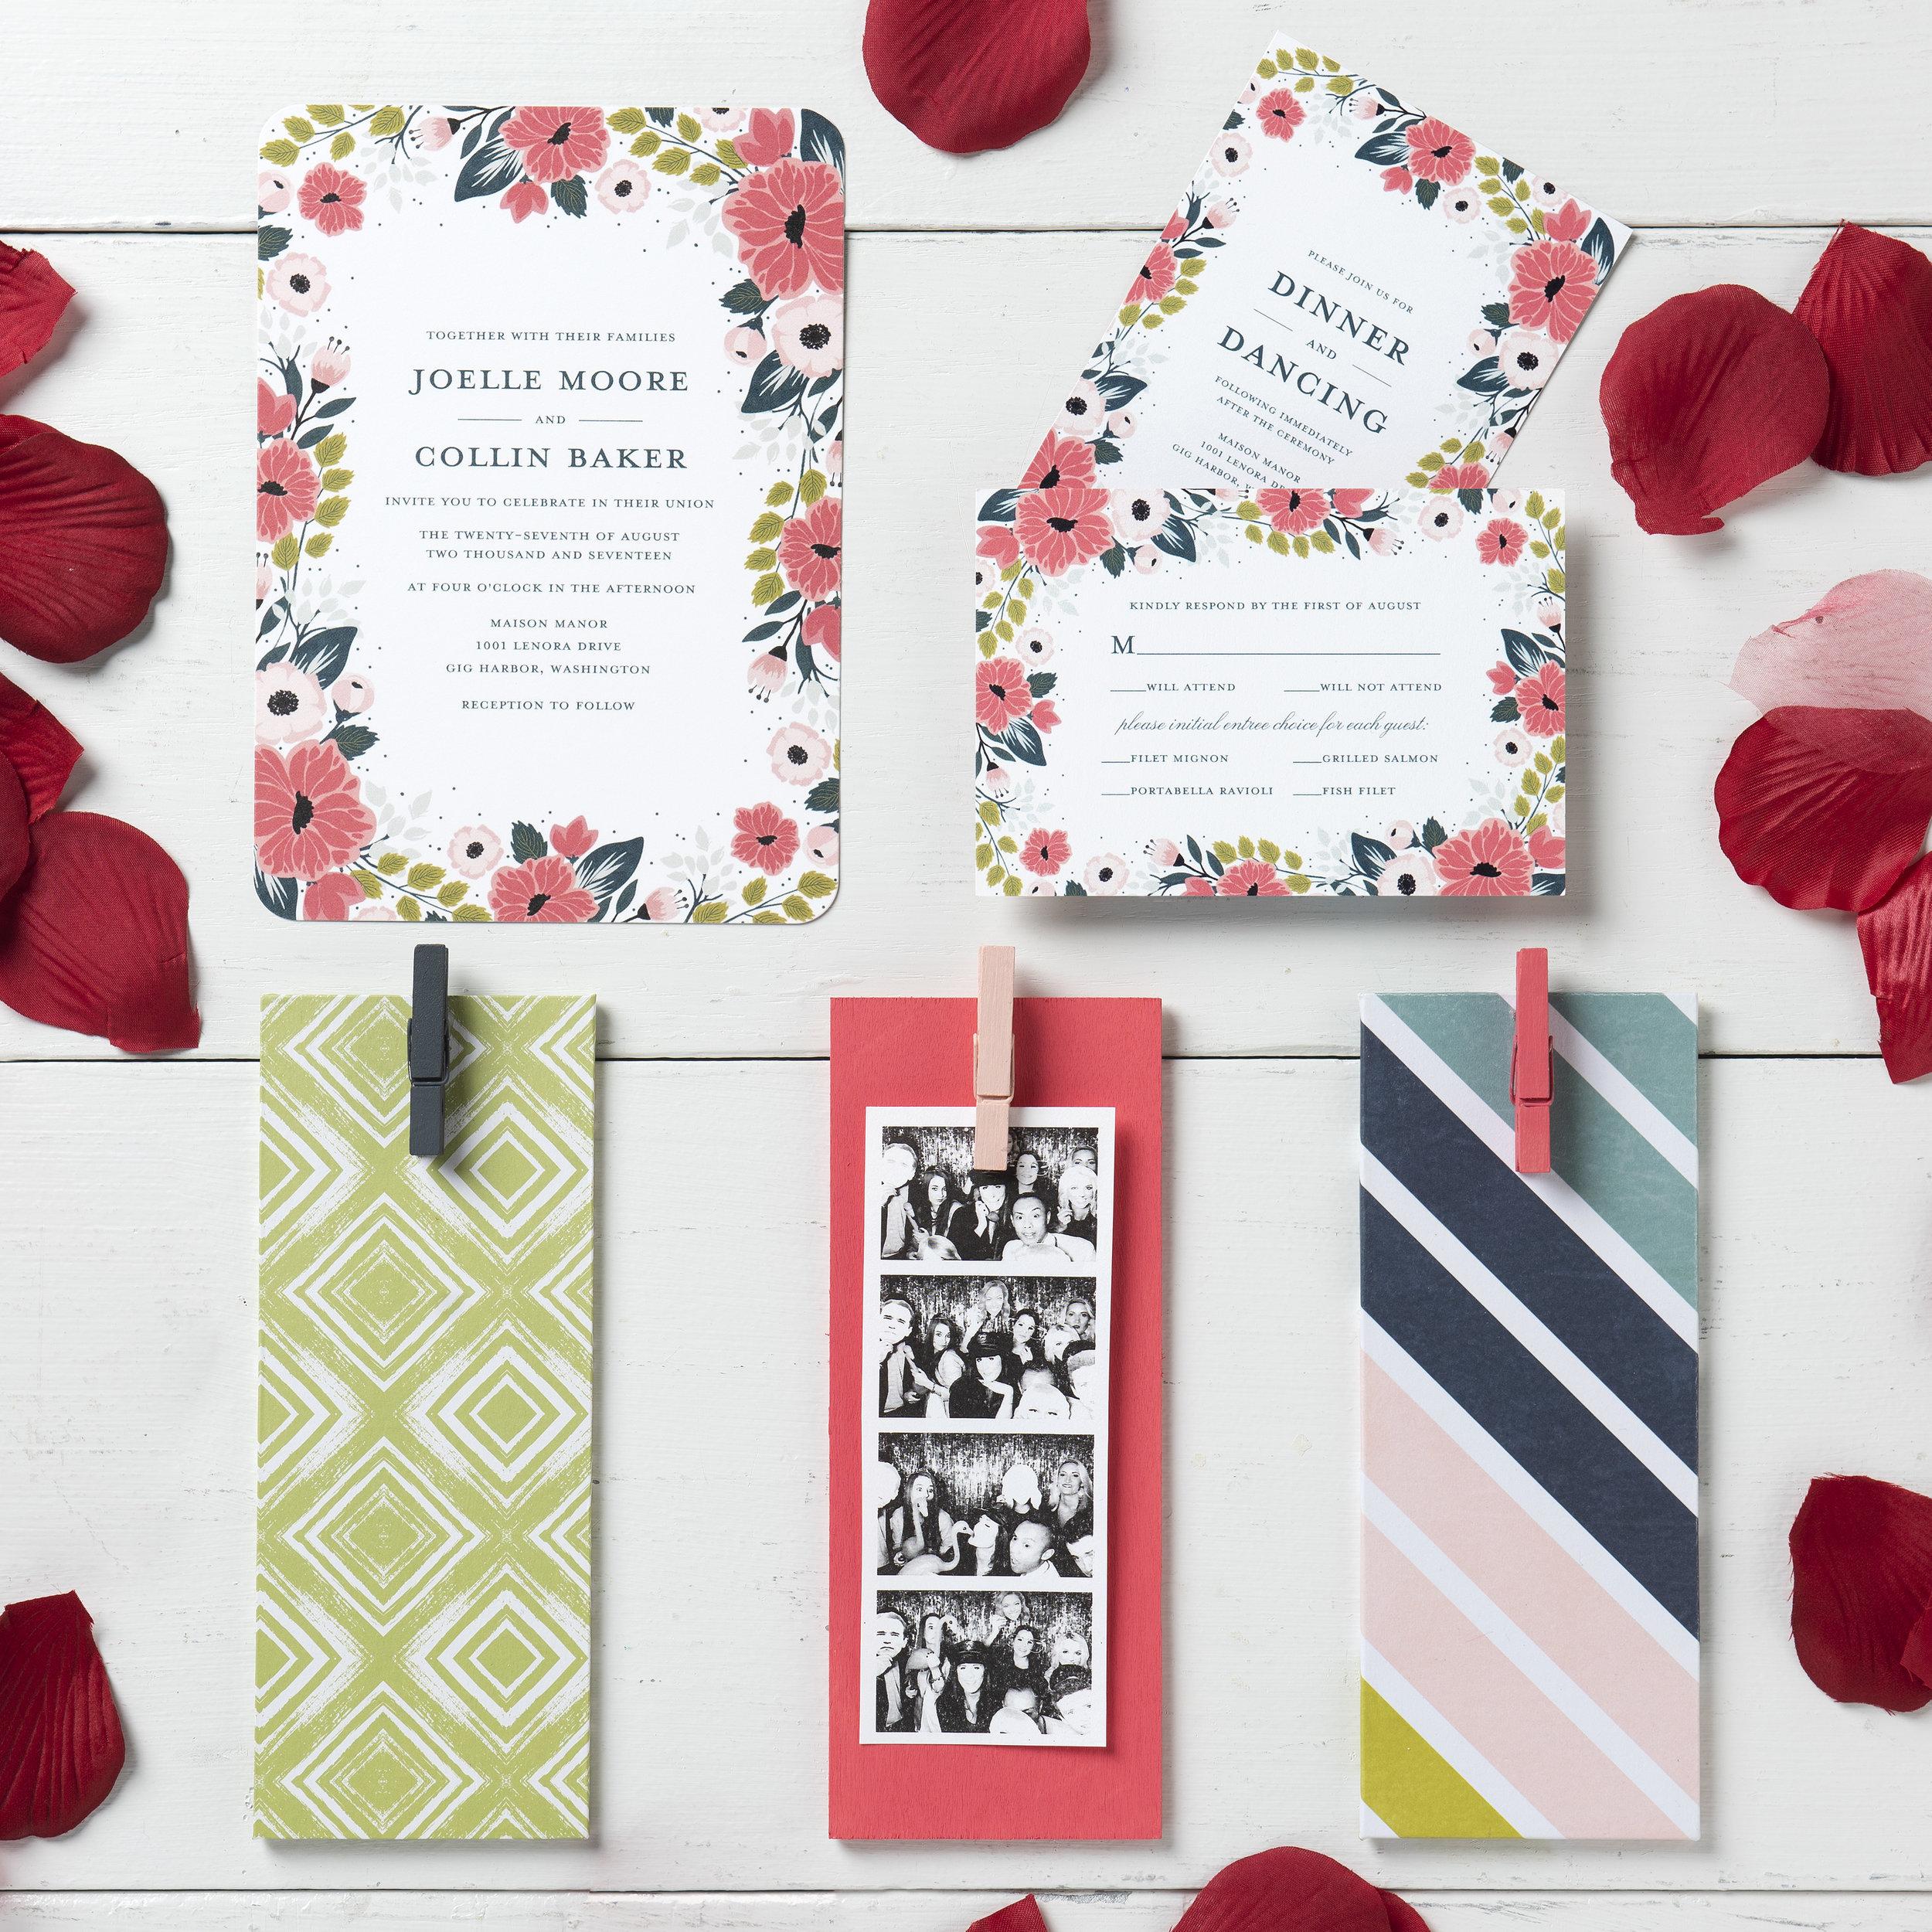 mixbook-marble-wedding-plaid-craft-diy-invitation-3.jpg